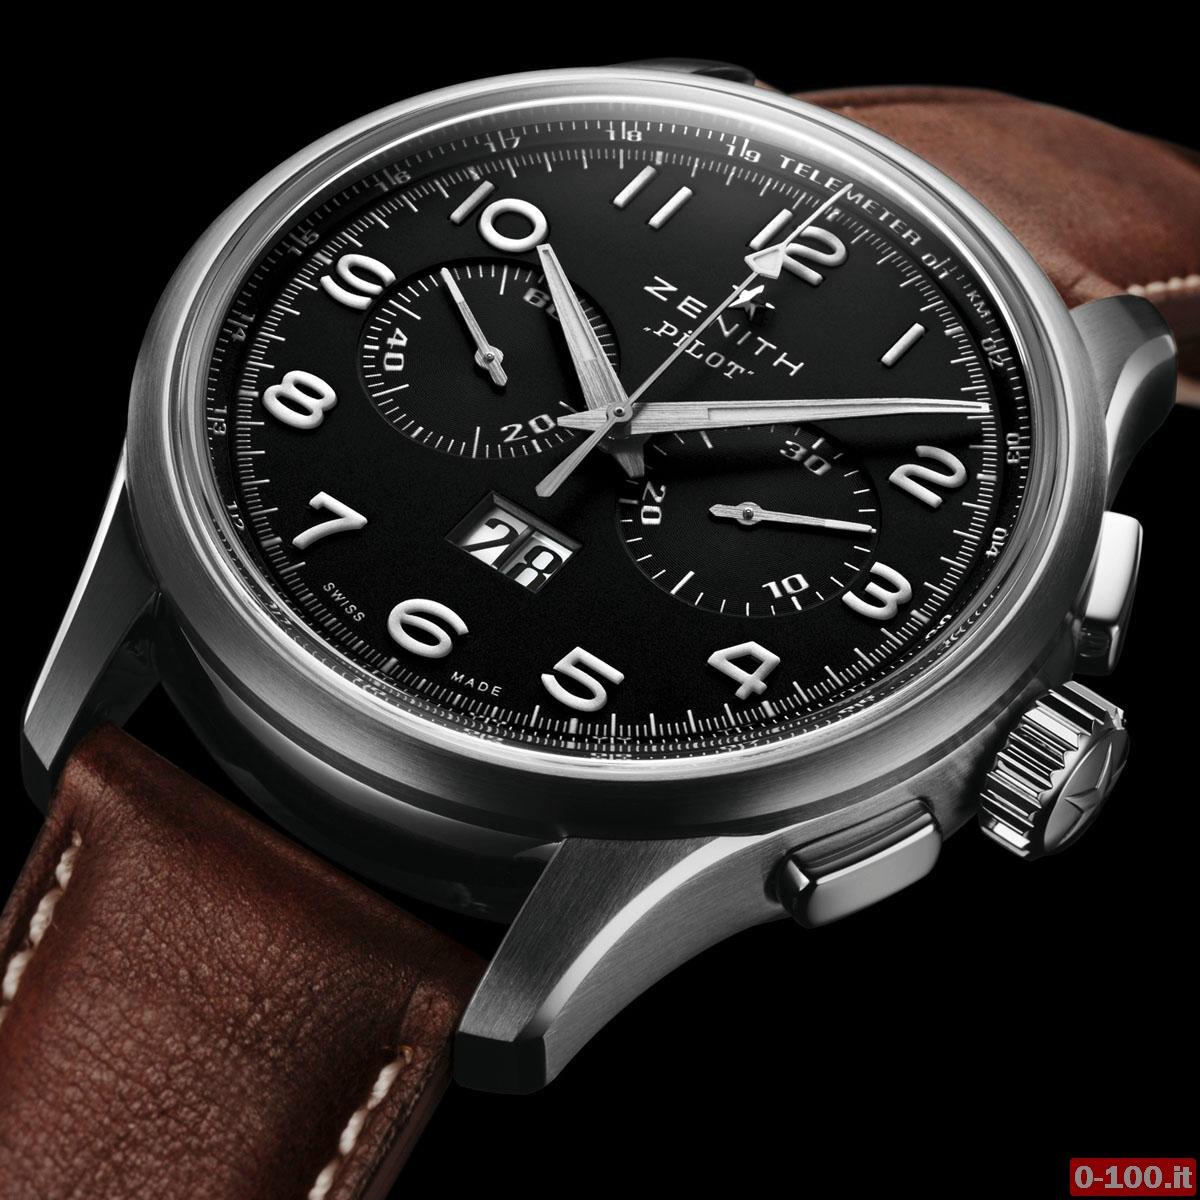 zenith-pilot-big-date-special_0-100_17